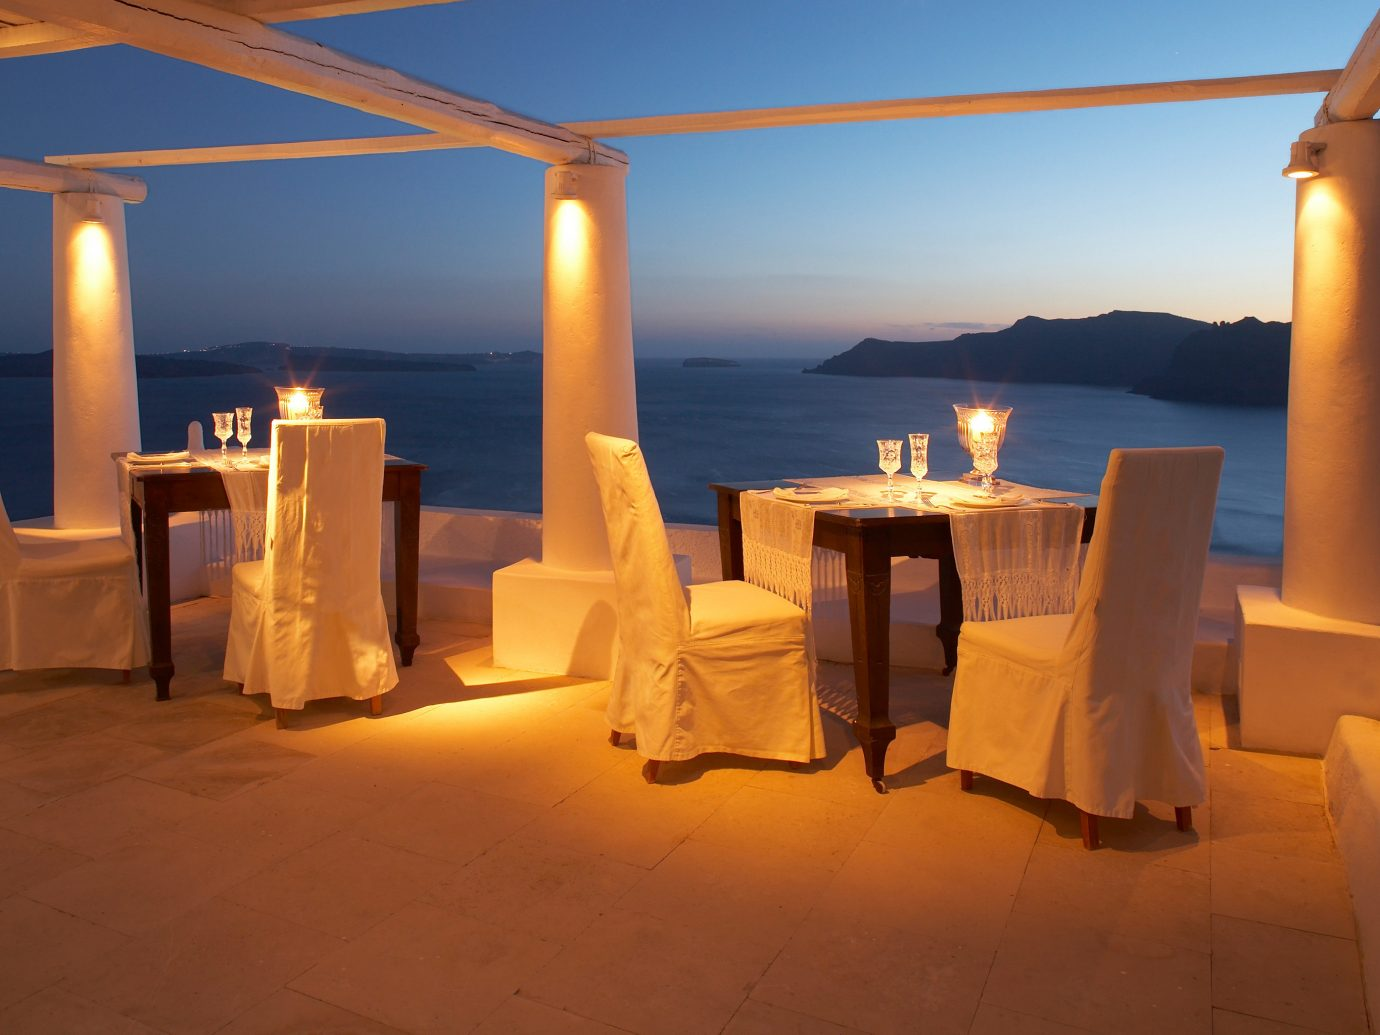 Beachfront Dining Drink Eat Greece Hotels Ocean Romantic Santorini Sunset sky outdoor light evening lighting shape restaurant